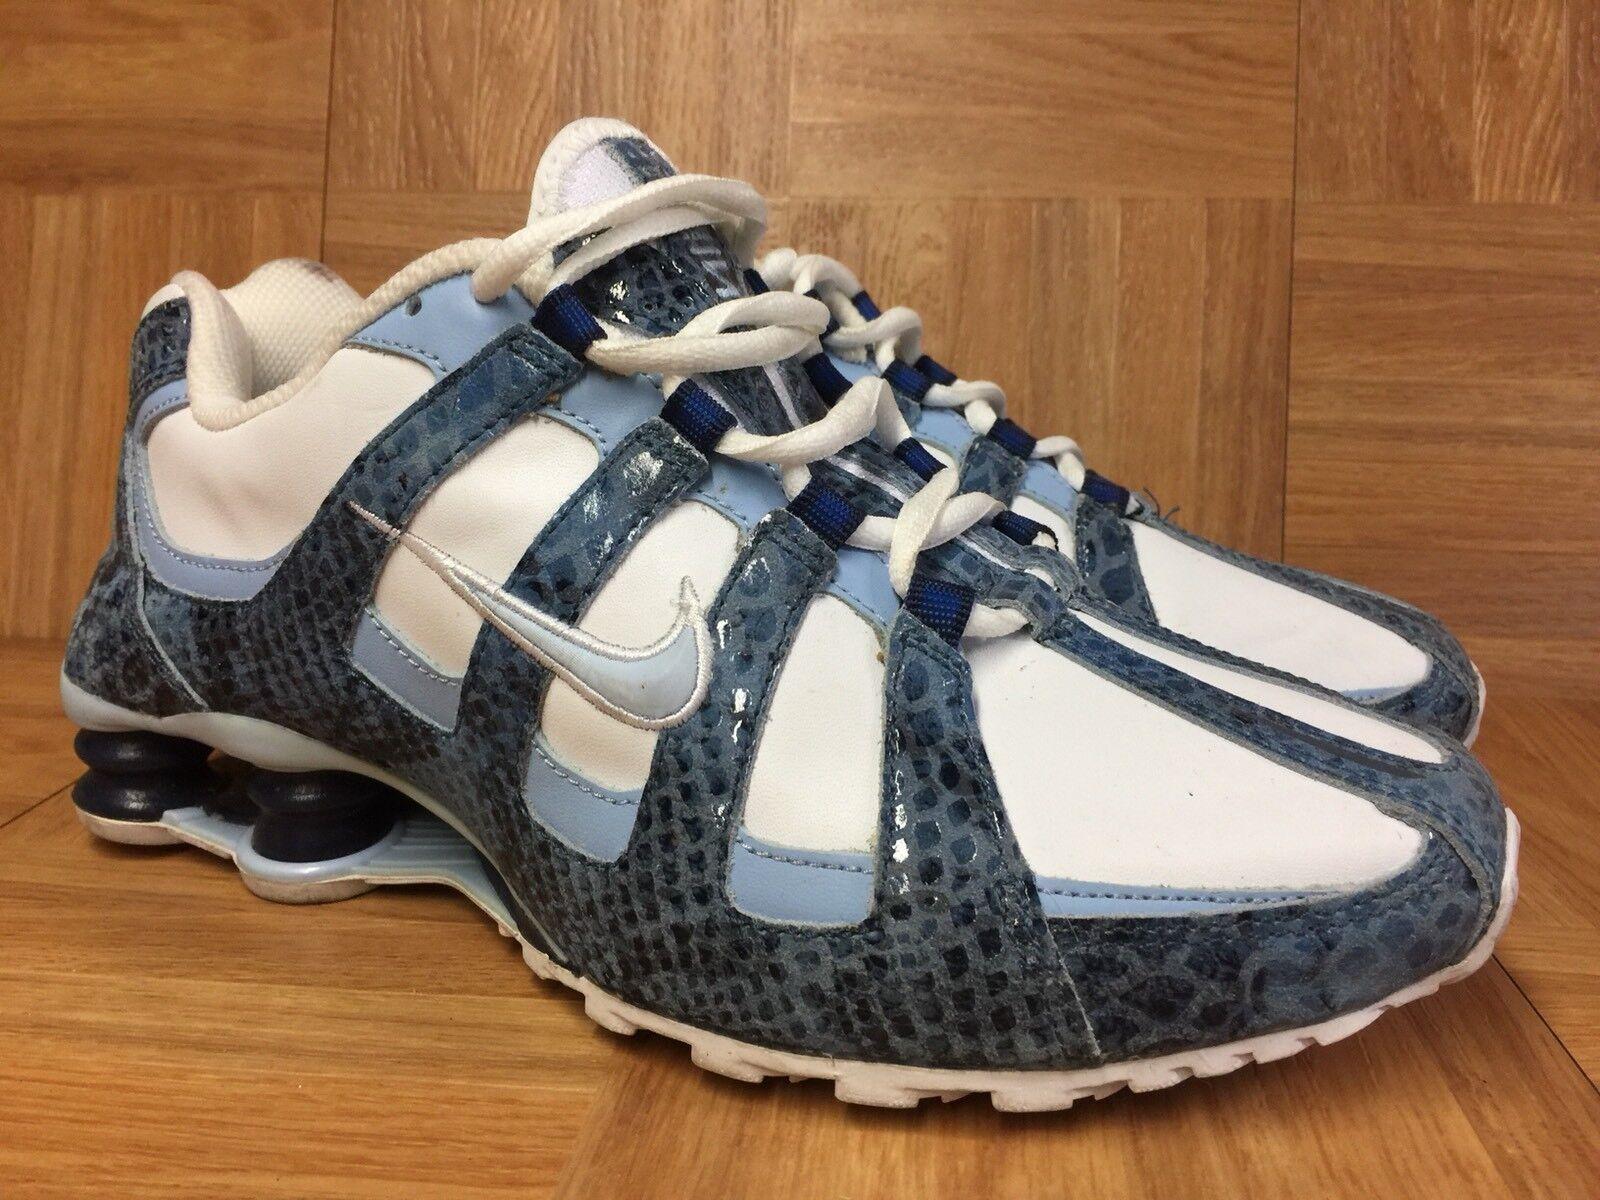 RARE� Nike SHOX Turbo Snakeskin University Ice Blue Carolina Sz 9 311079-141 LE